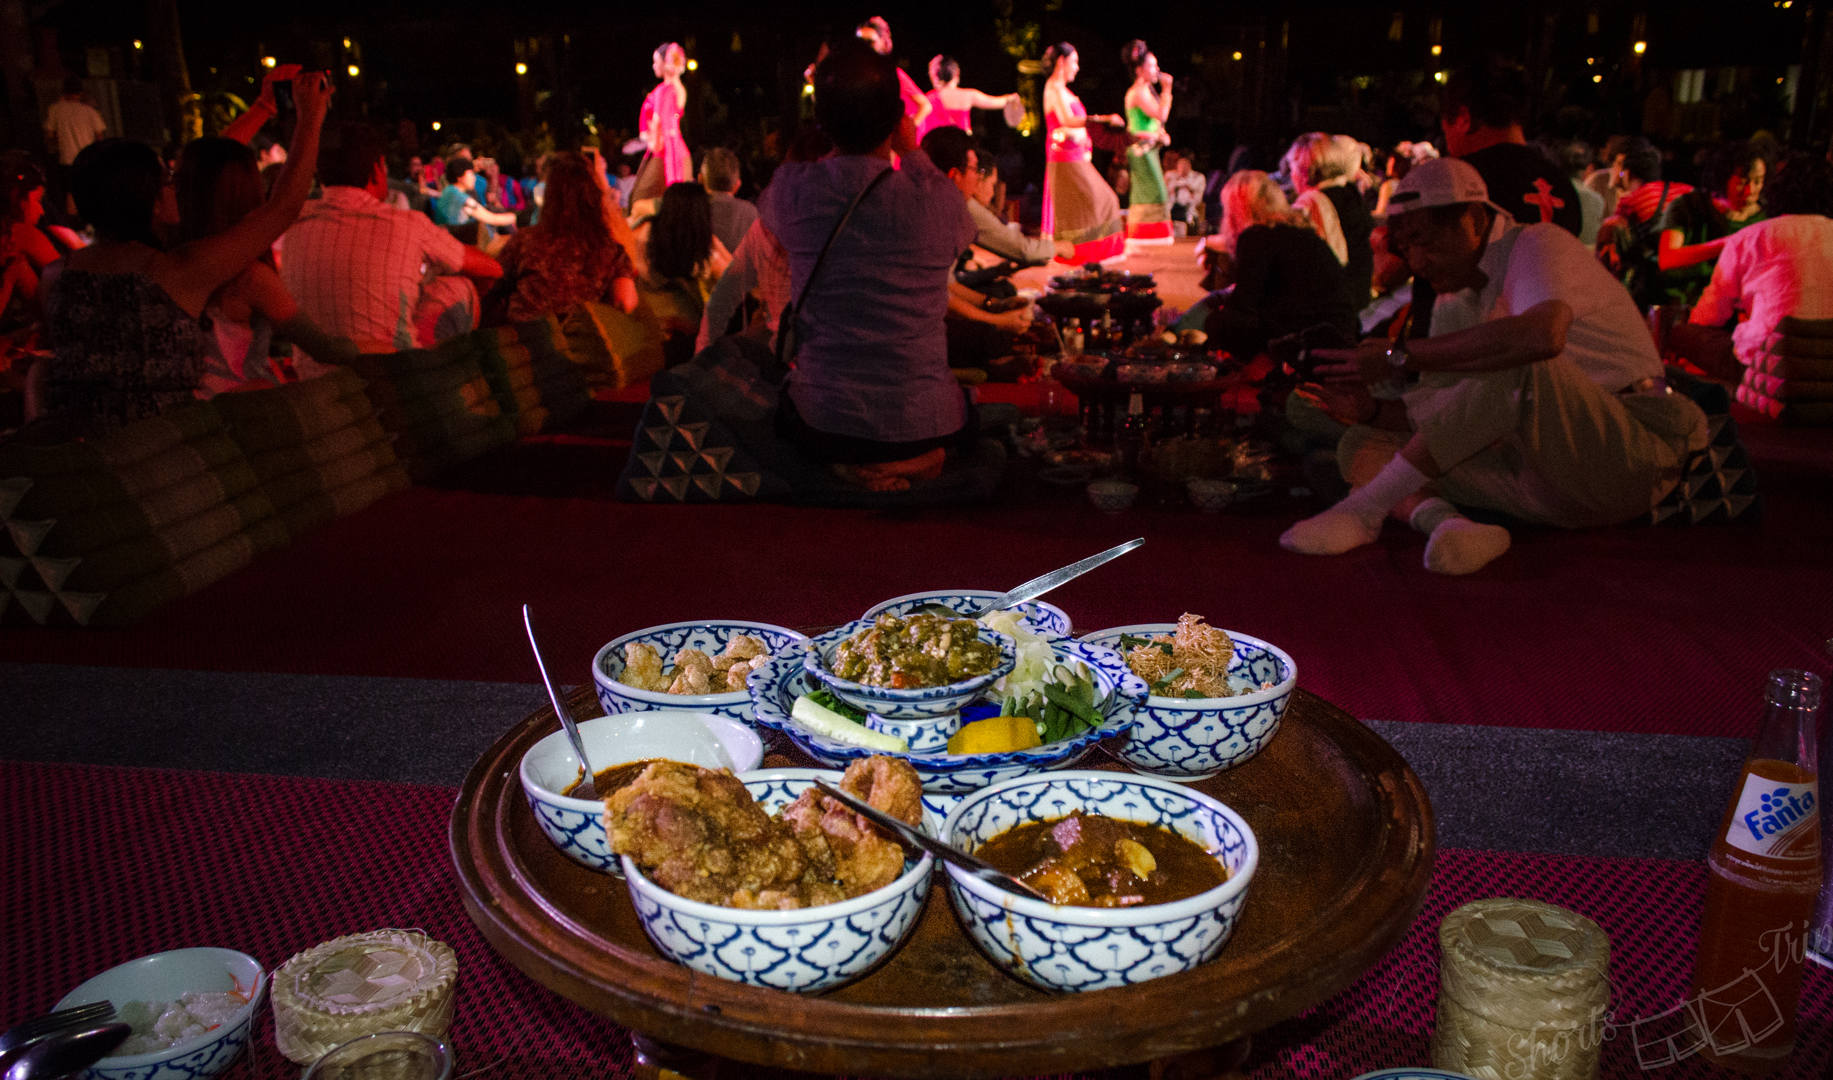 khantoke dinner, khantoke food, khantoke food performance